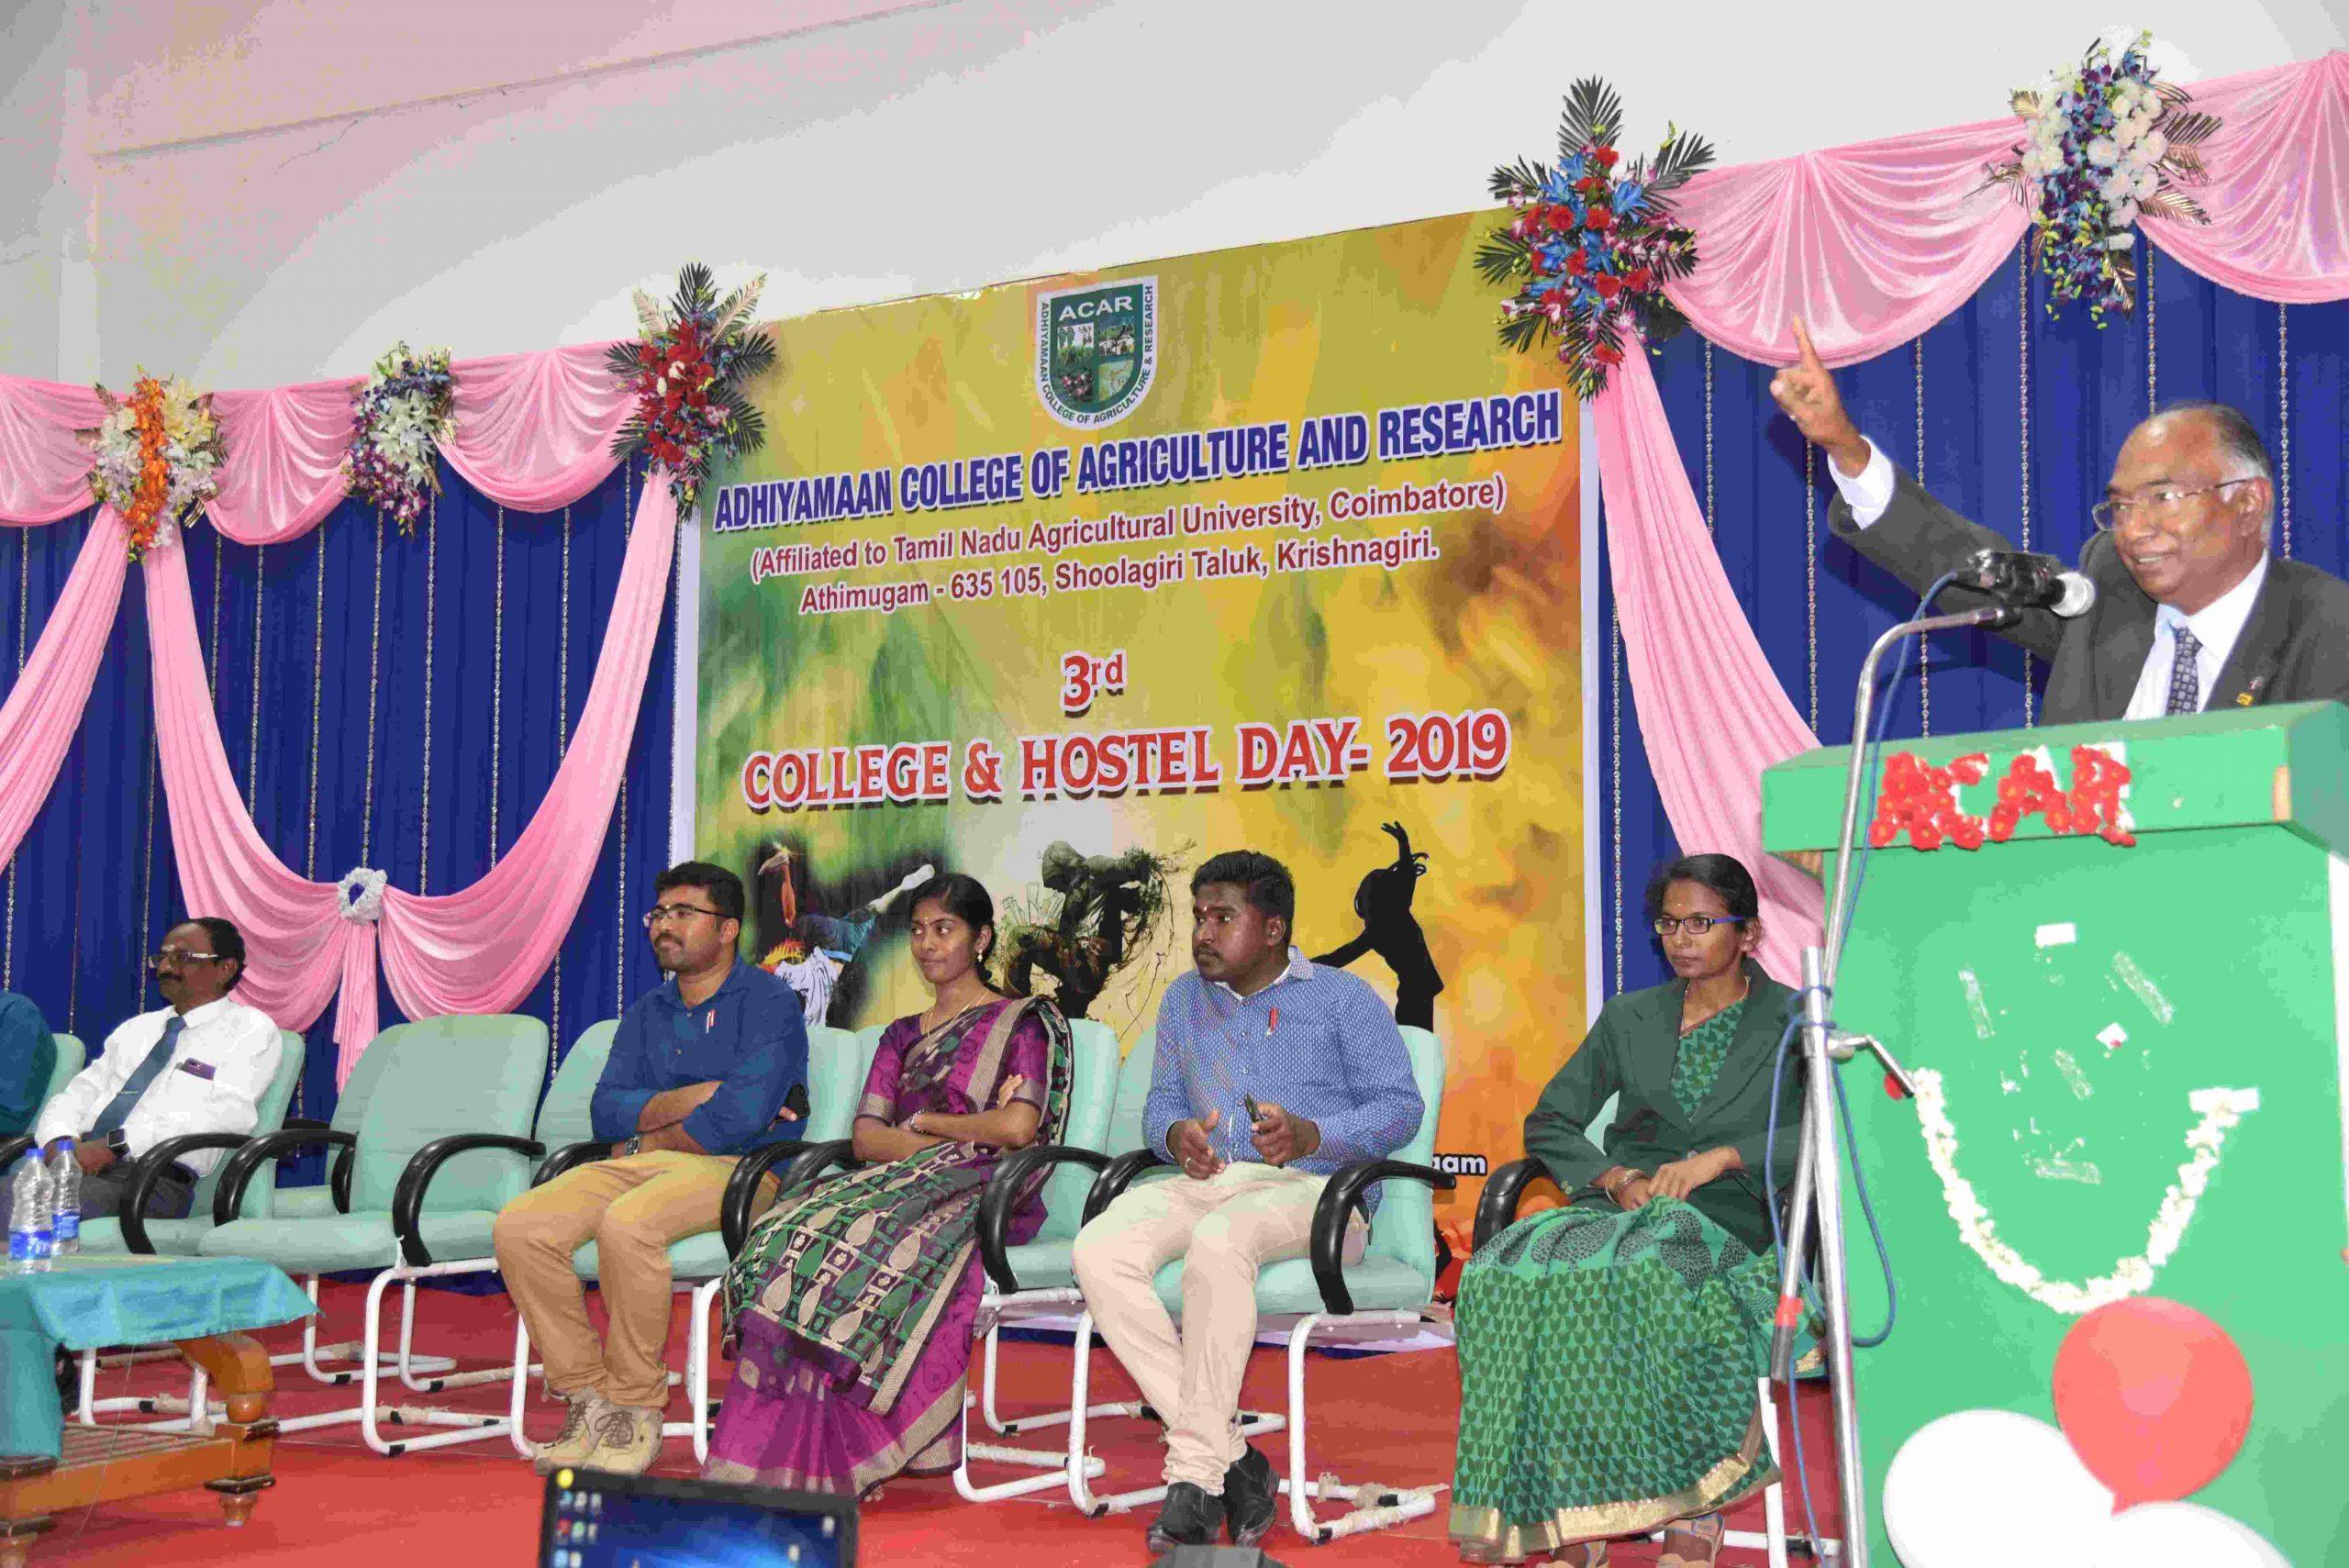 Adhiyamaan College of Agricultural and Research, Krishnagiri Image